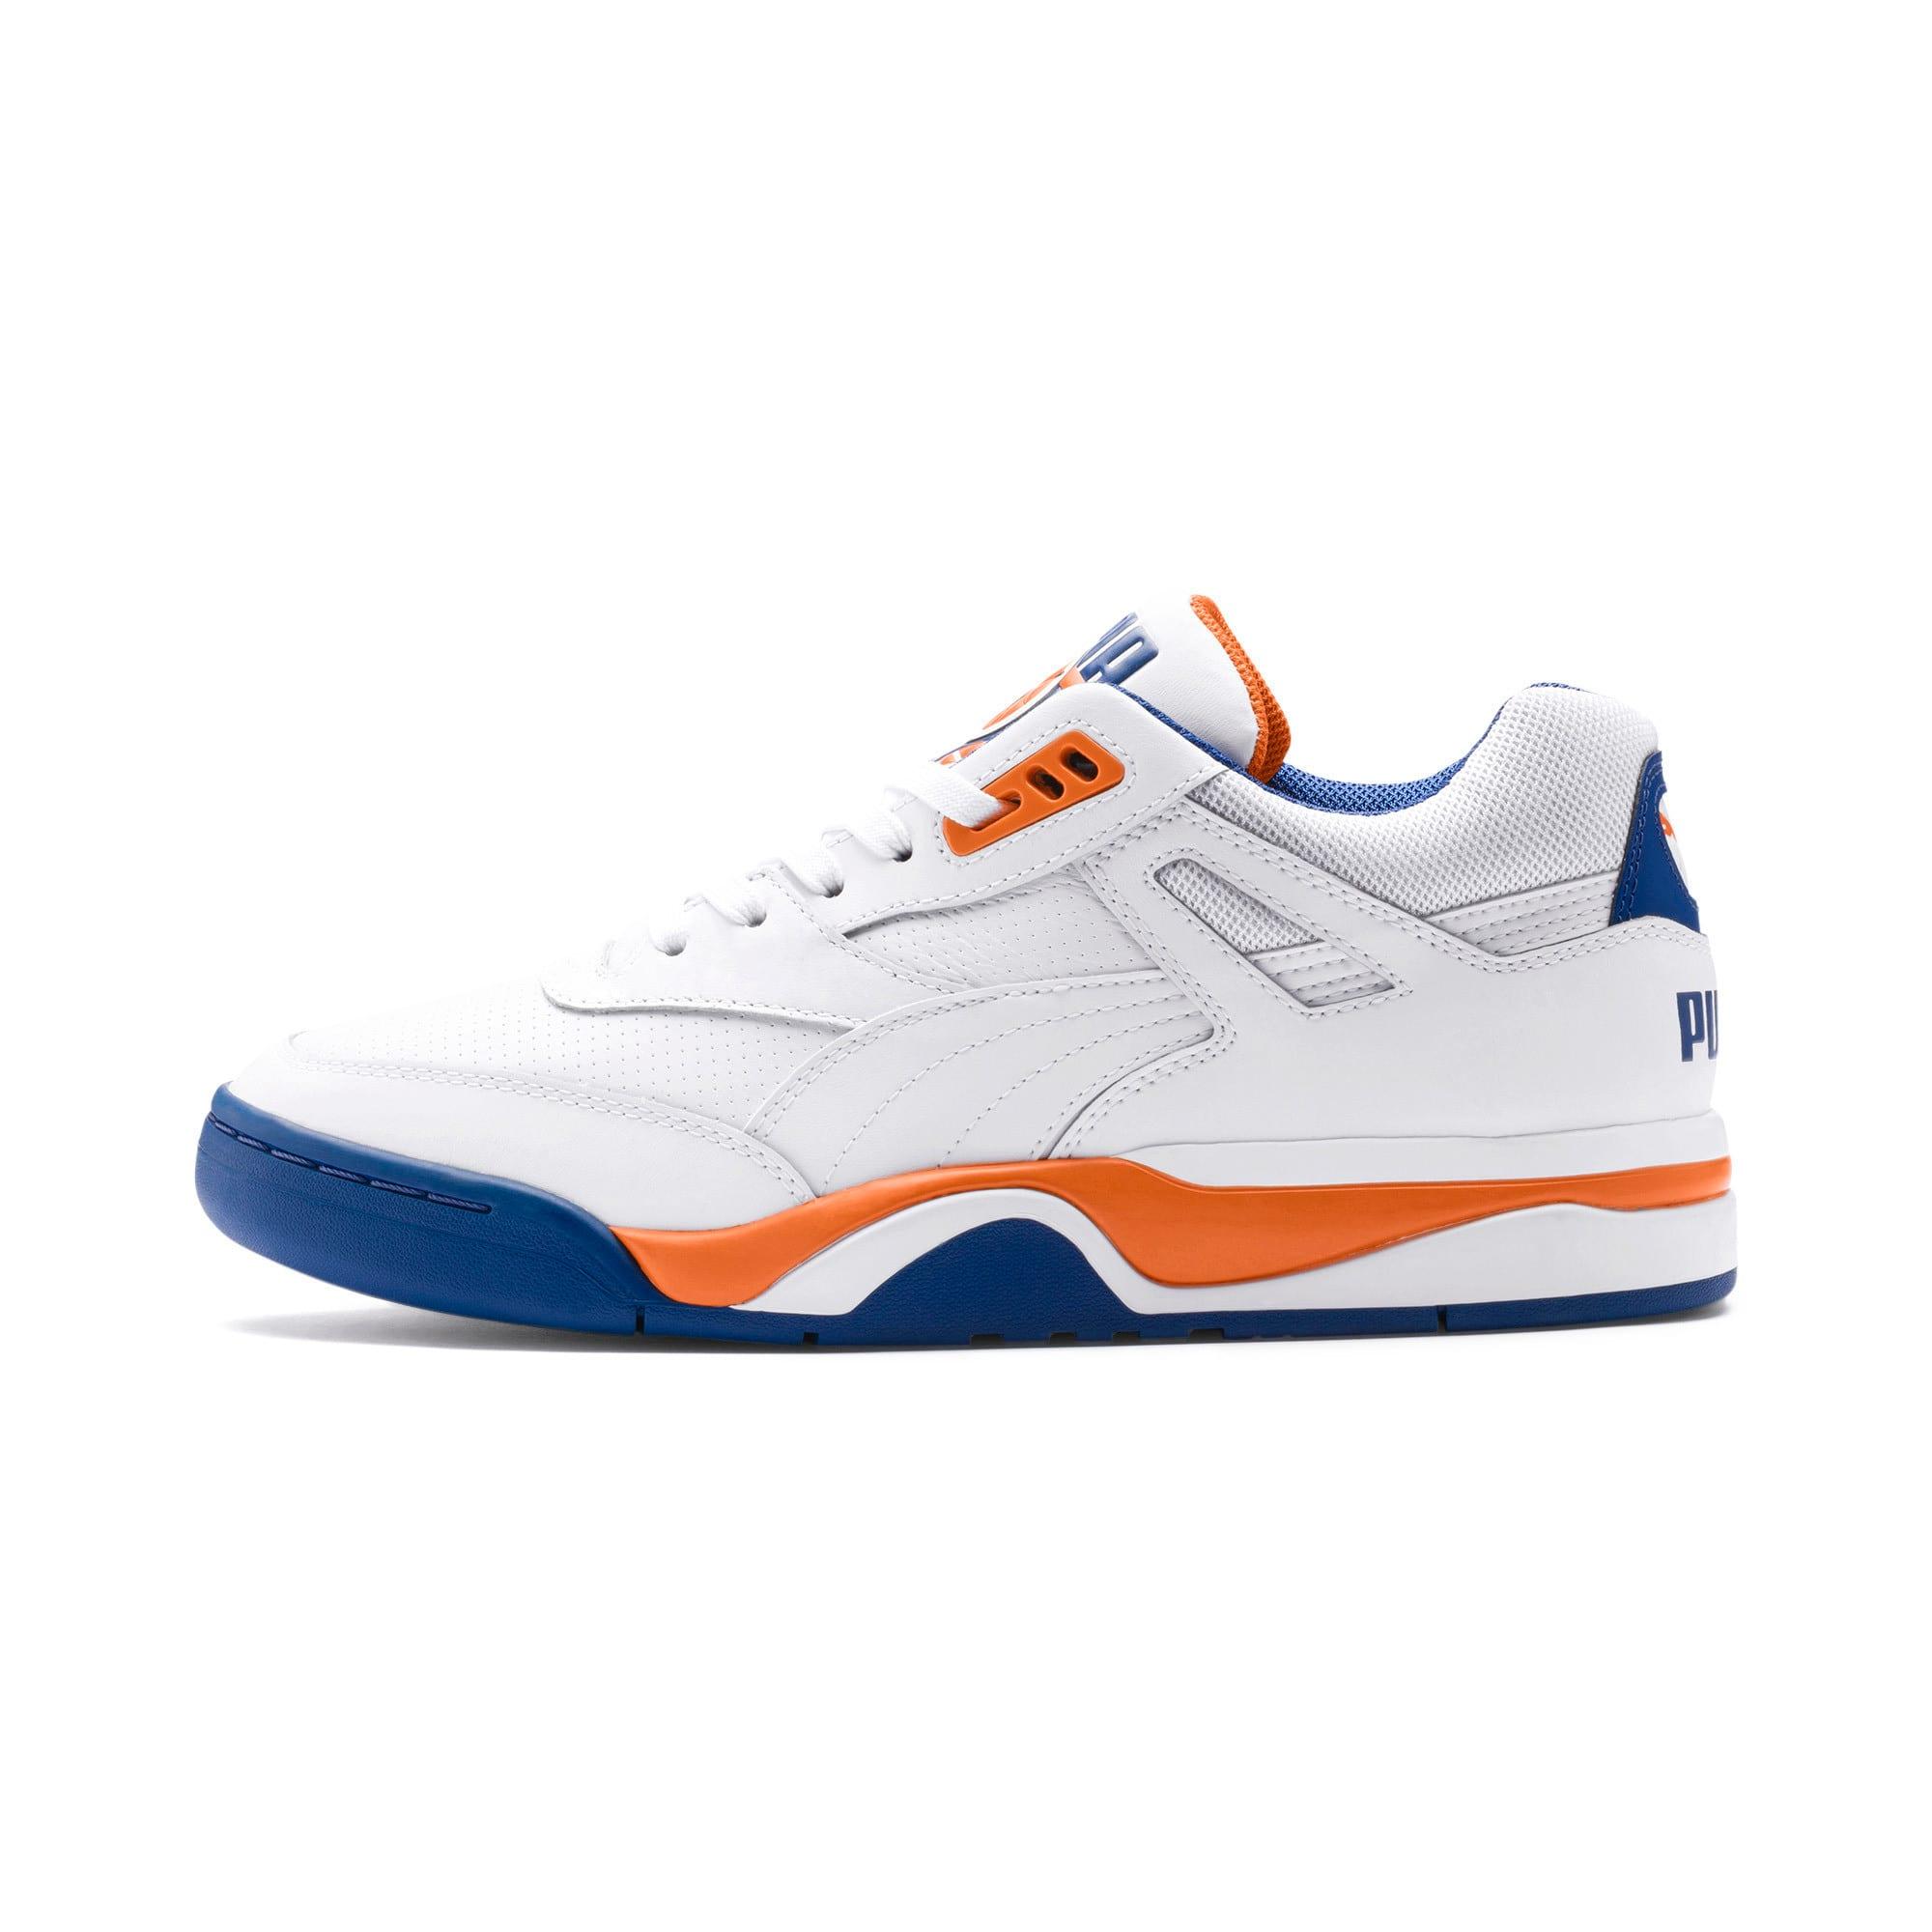 Thumbnail 1 of Palace Guard Sneakers, P White-Jaffa Orange-G Blue, medium